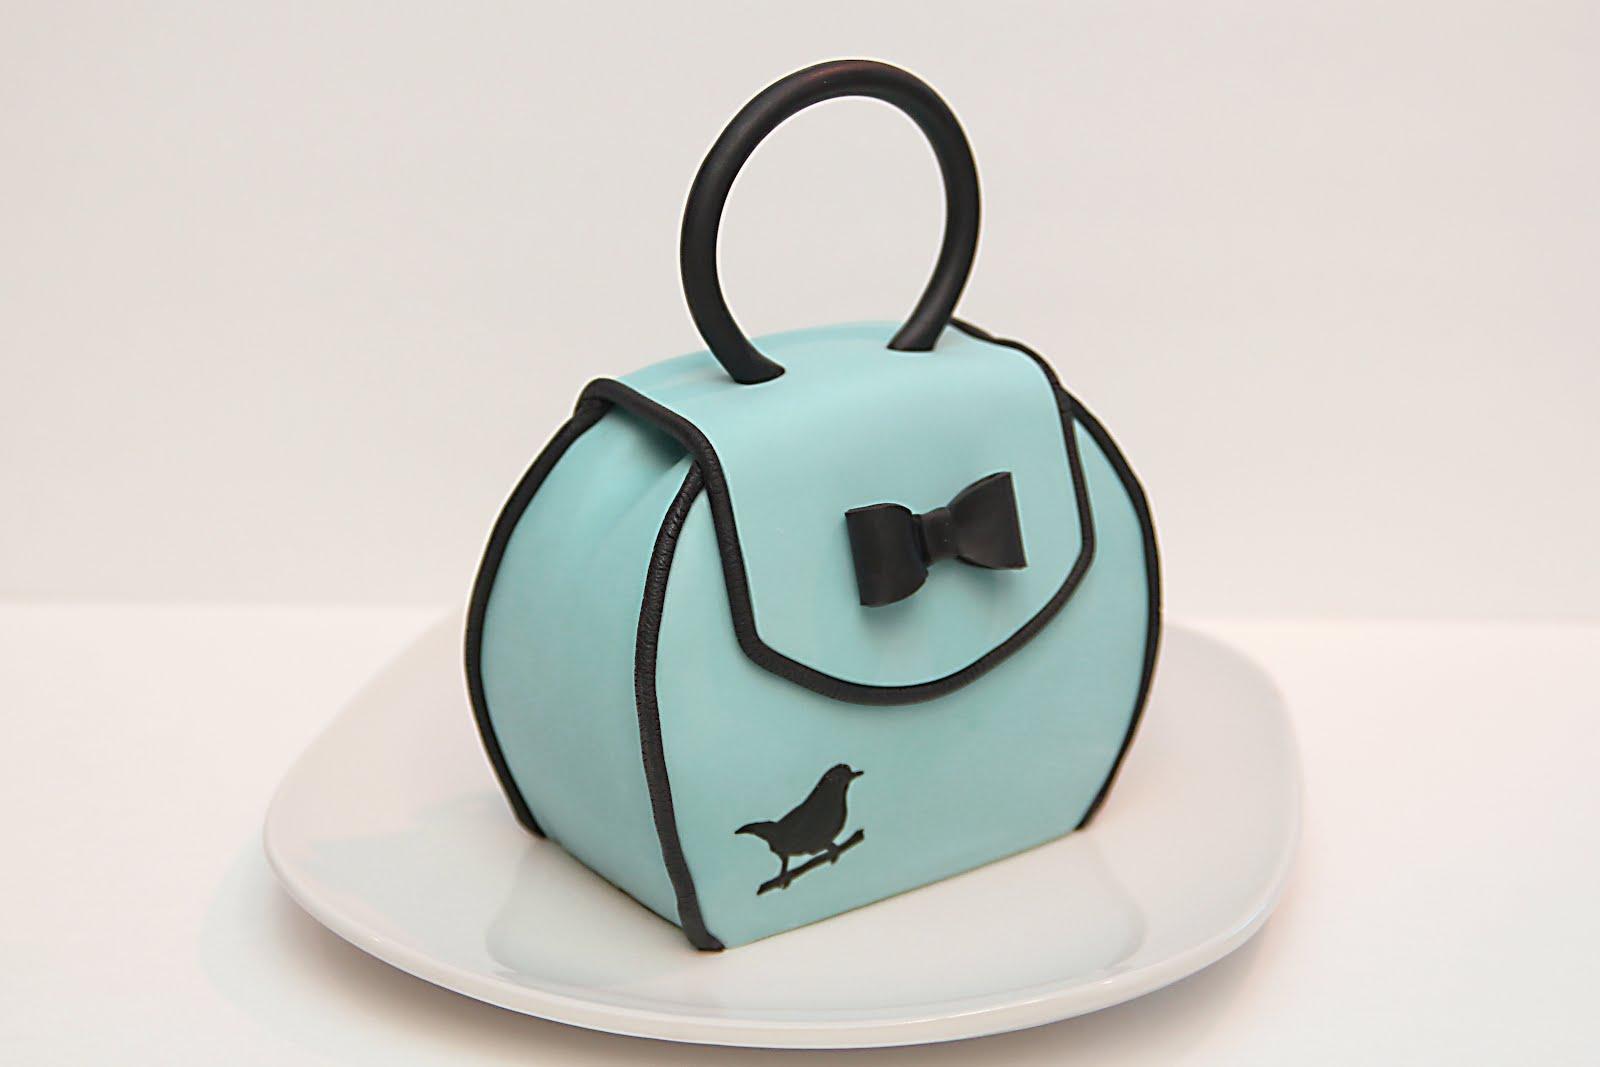 How to Make Purse Cake Tutorial